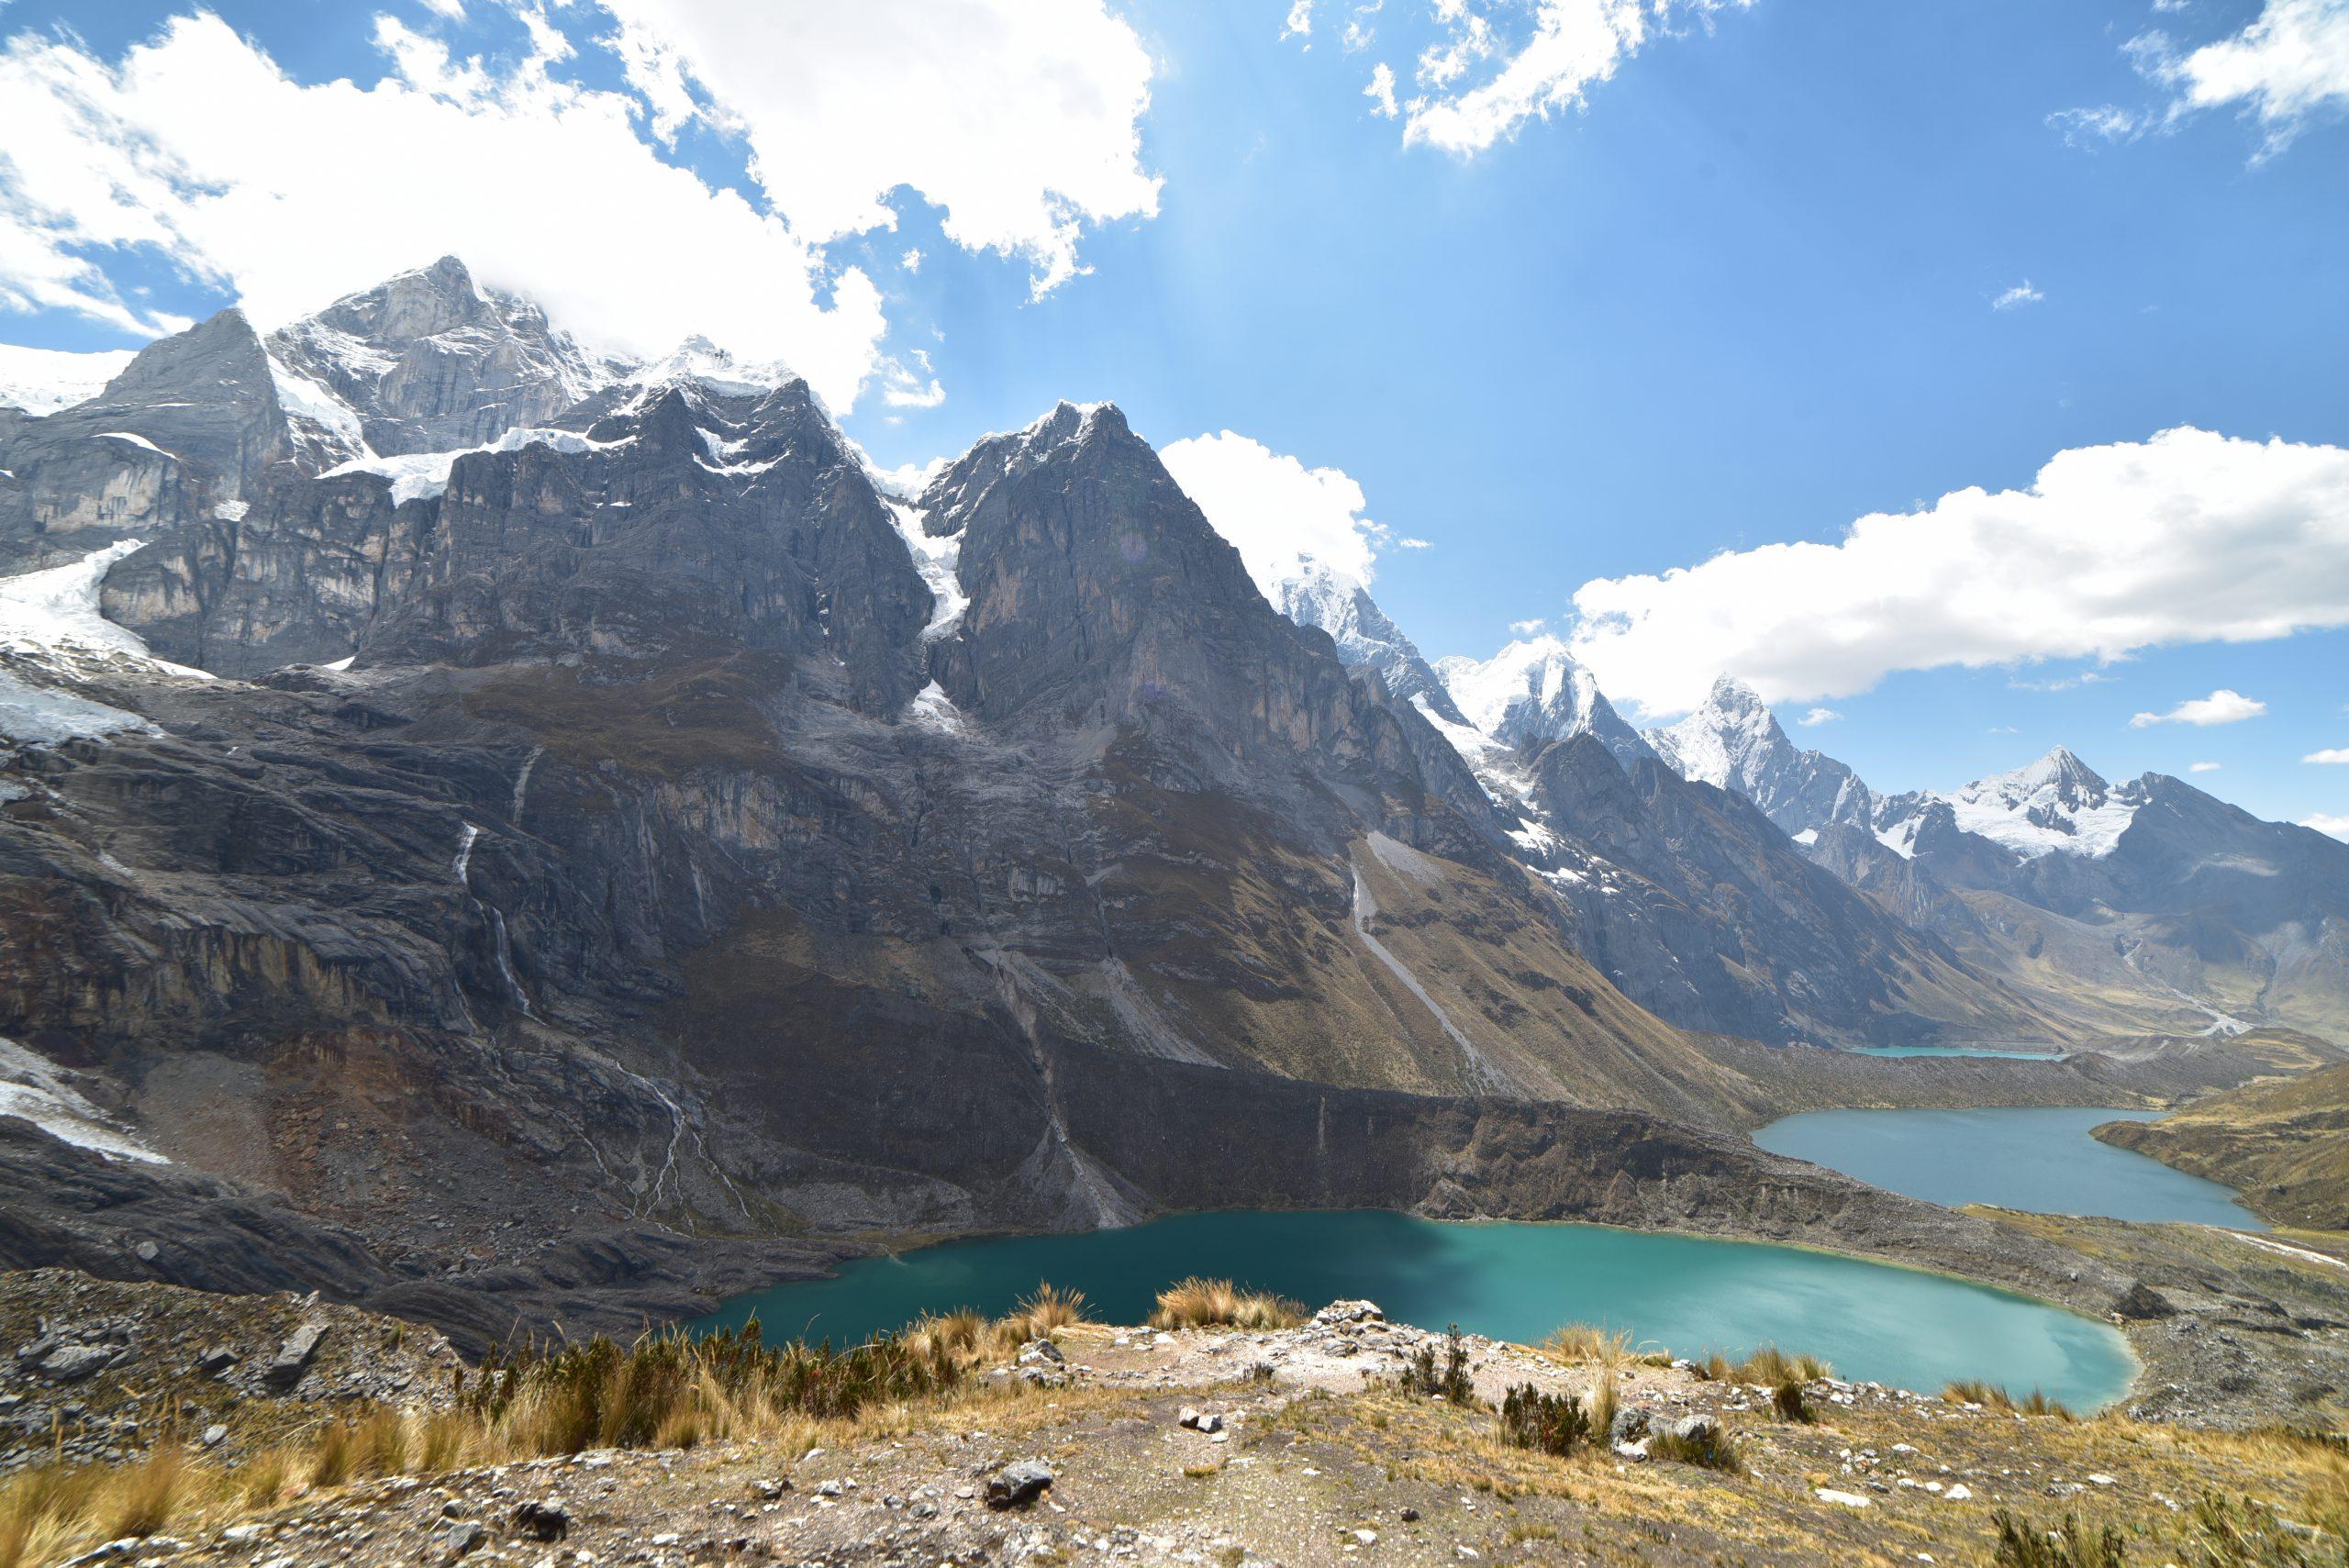 Conócenos - Q'oyllur Perú